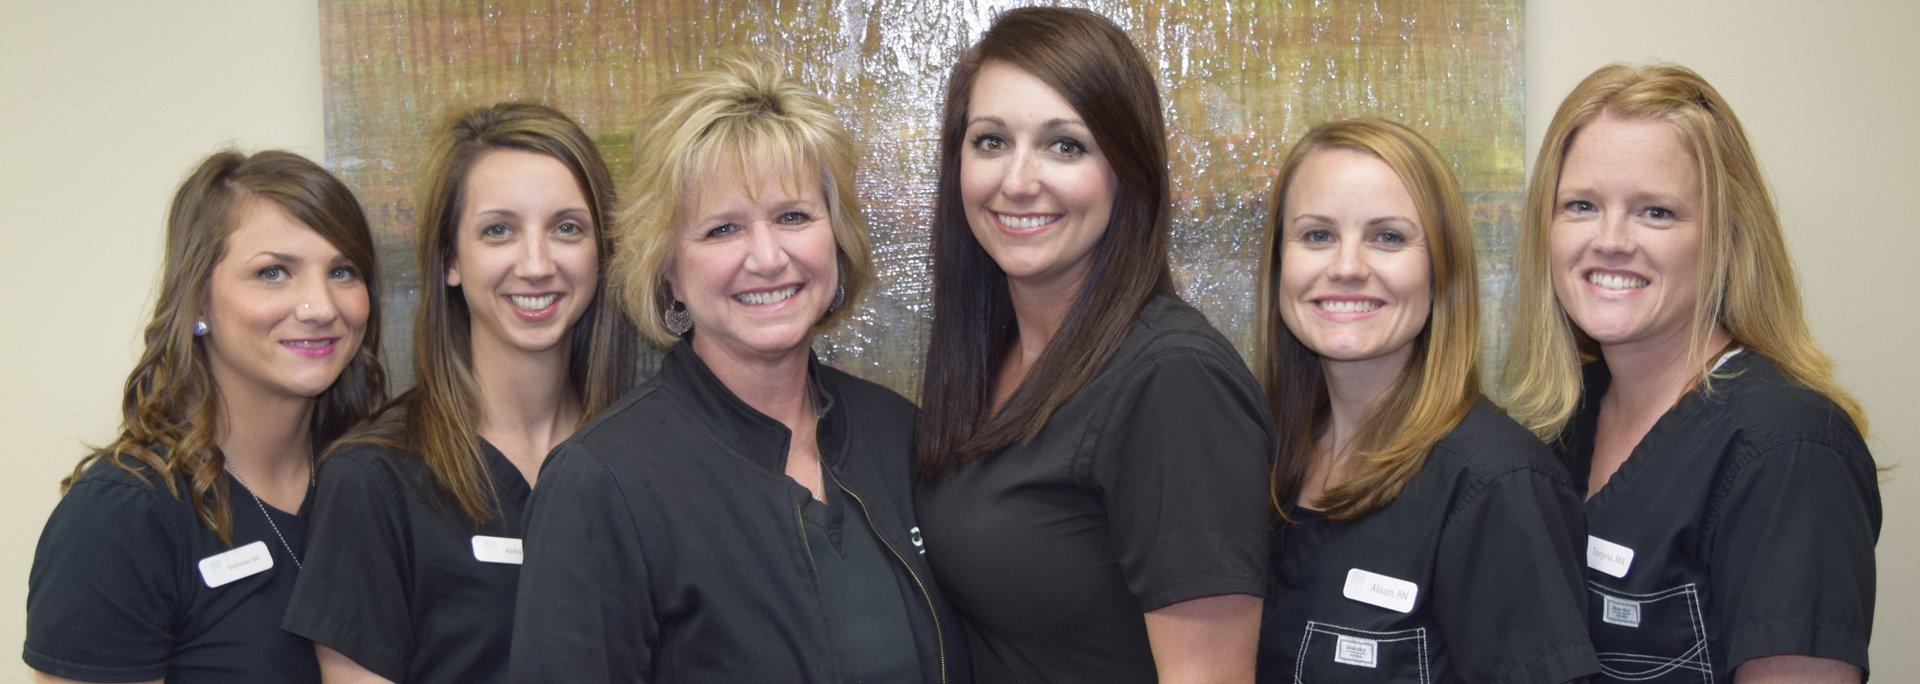 Conway Women's Health Center, nurses